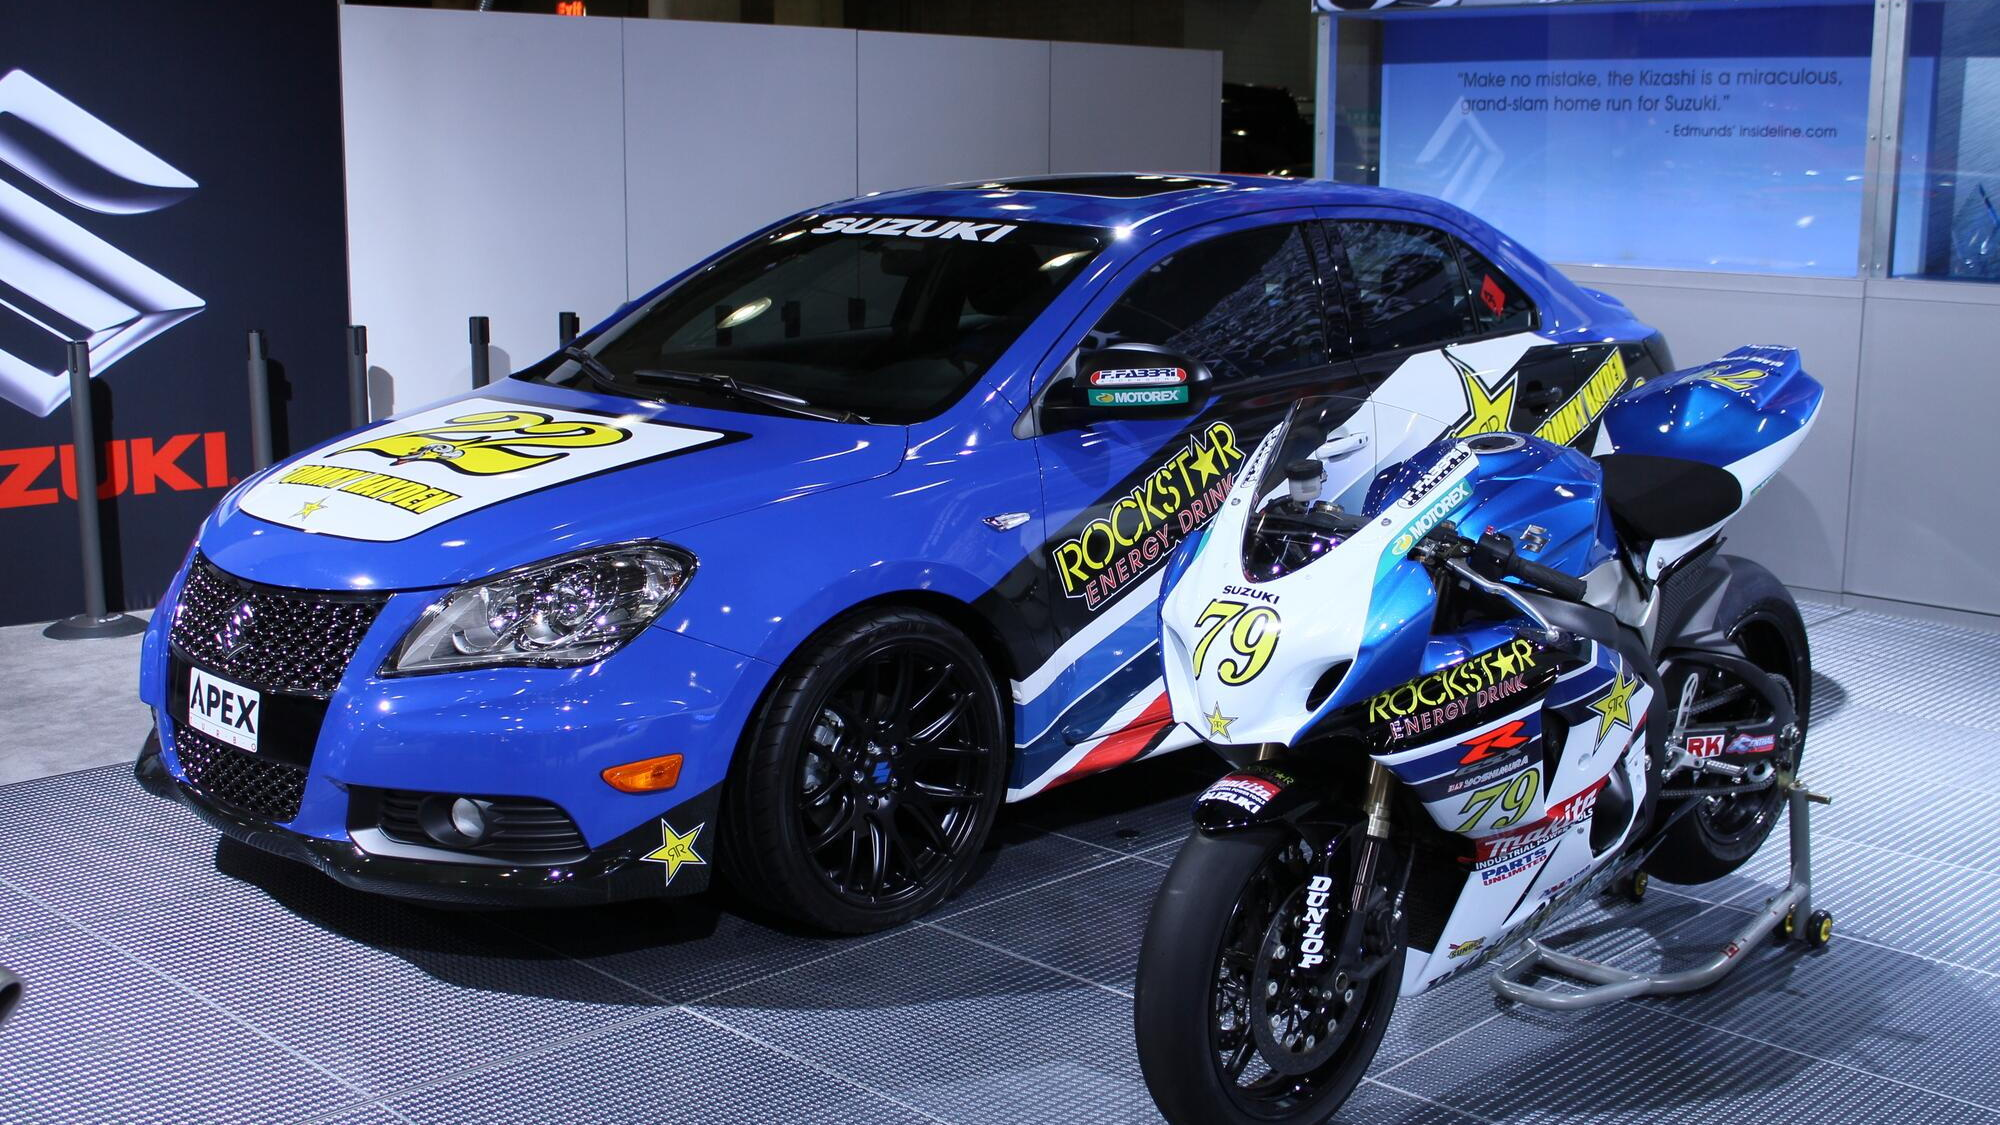 Suzuki Apex Concept live photos